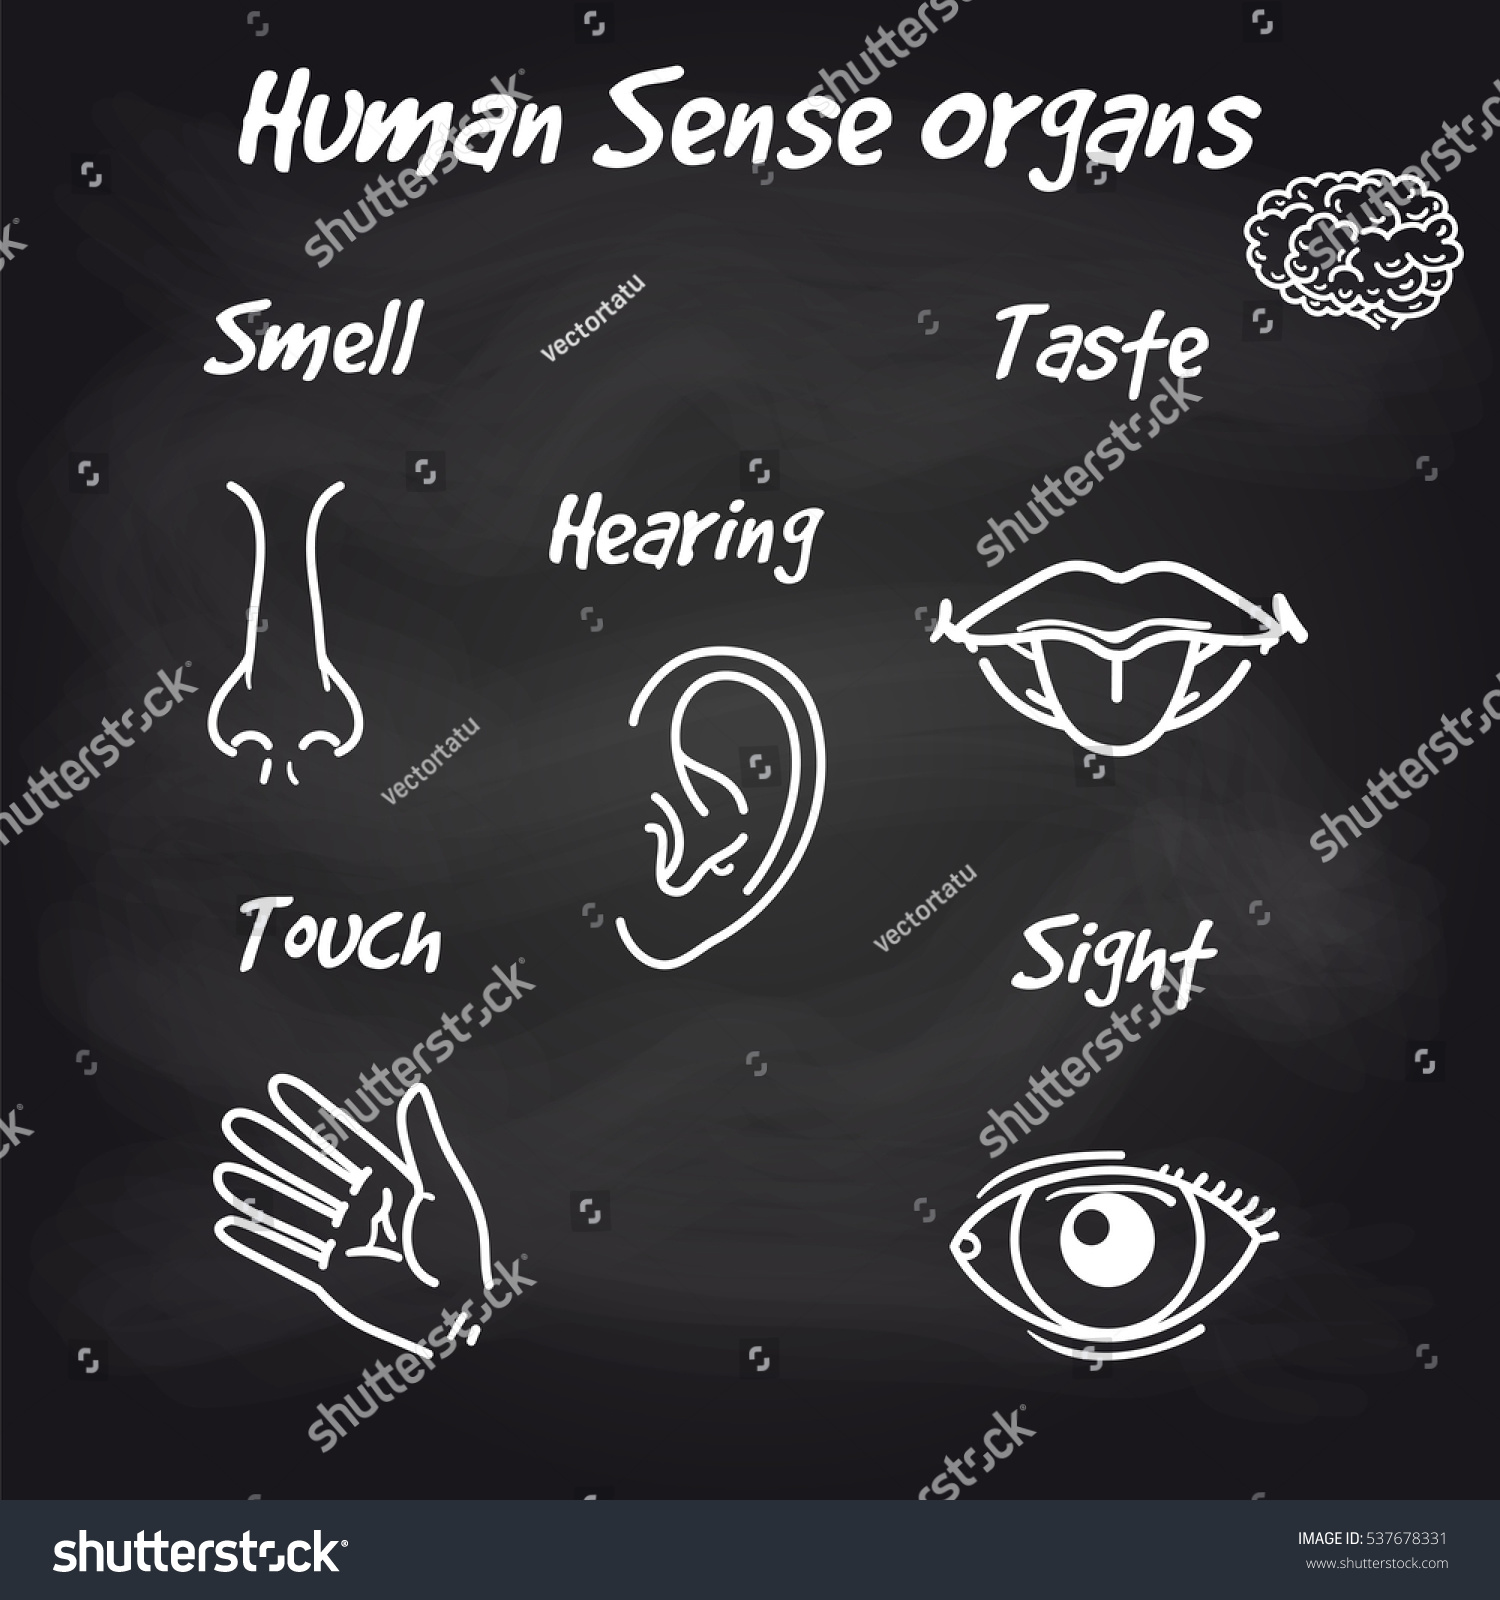 Human Sense Organs Icons On Chalkboard Stock Vector 537678331 ...